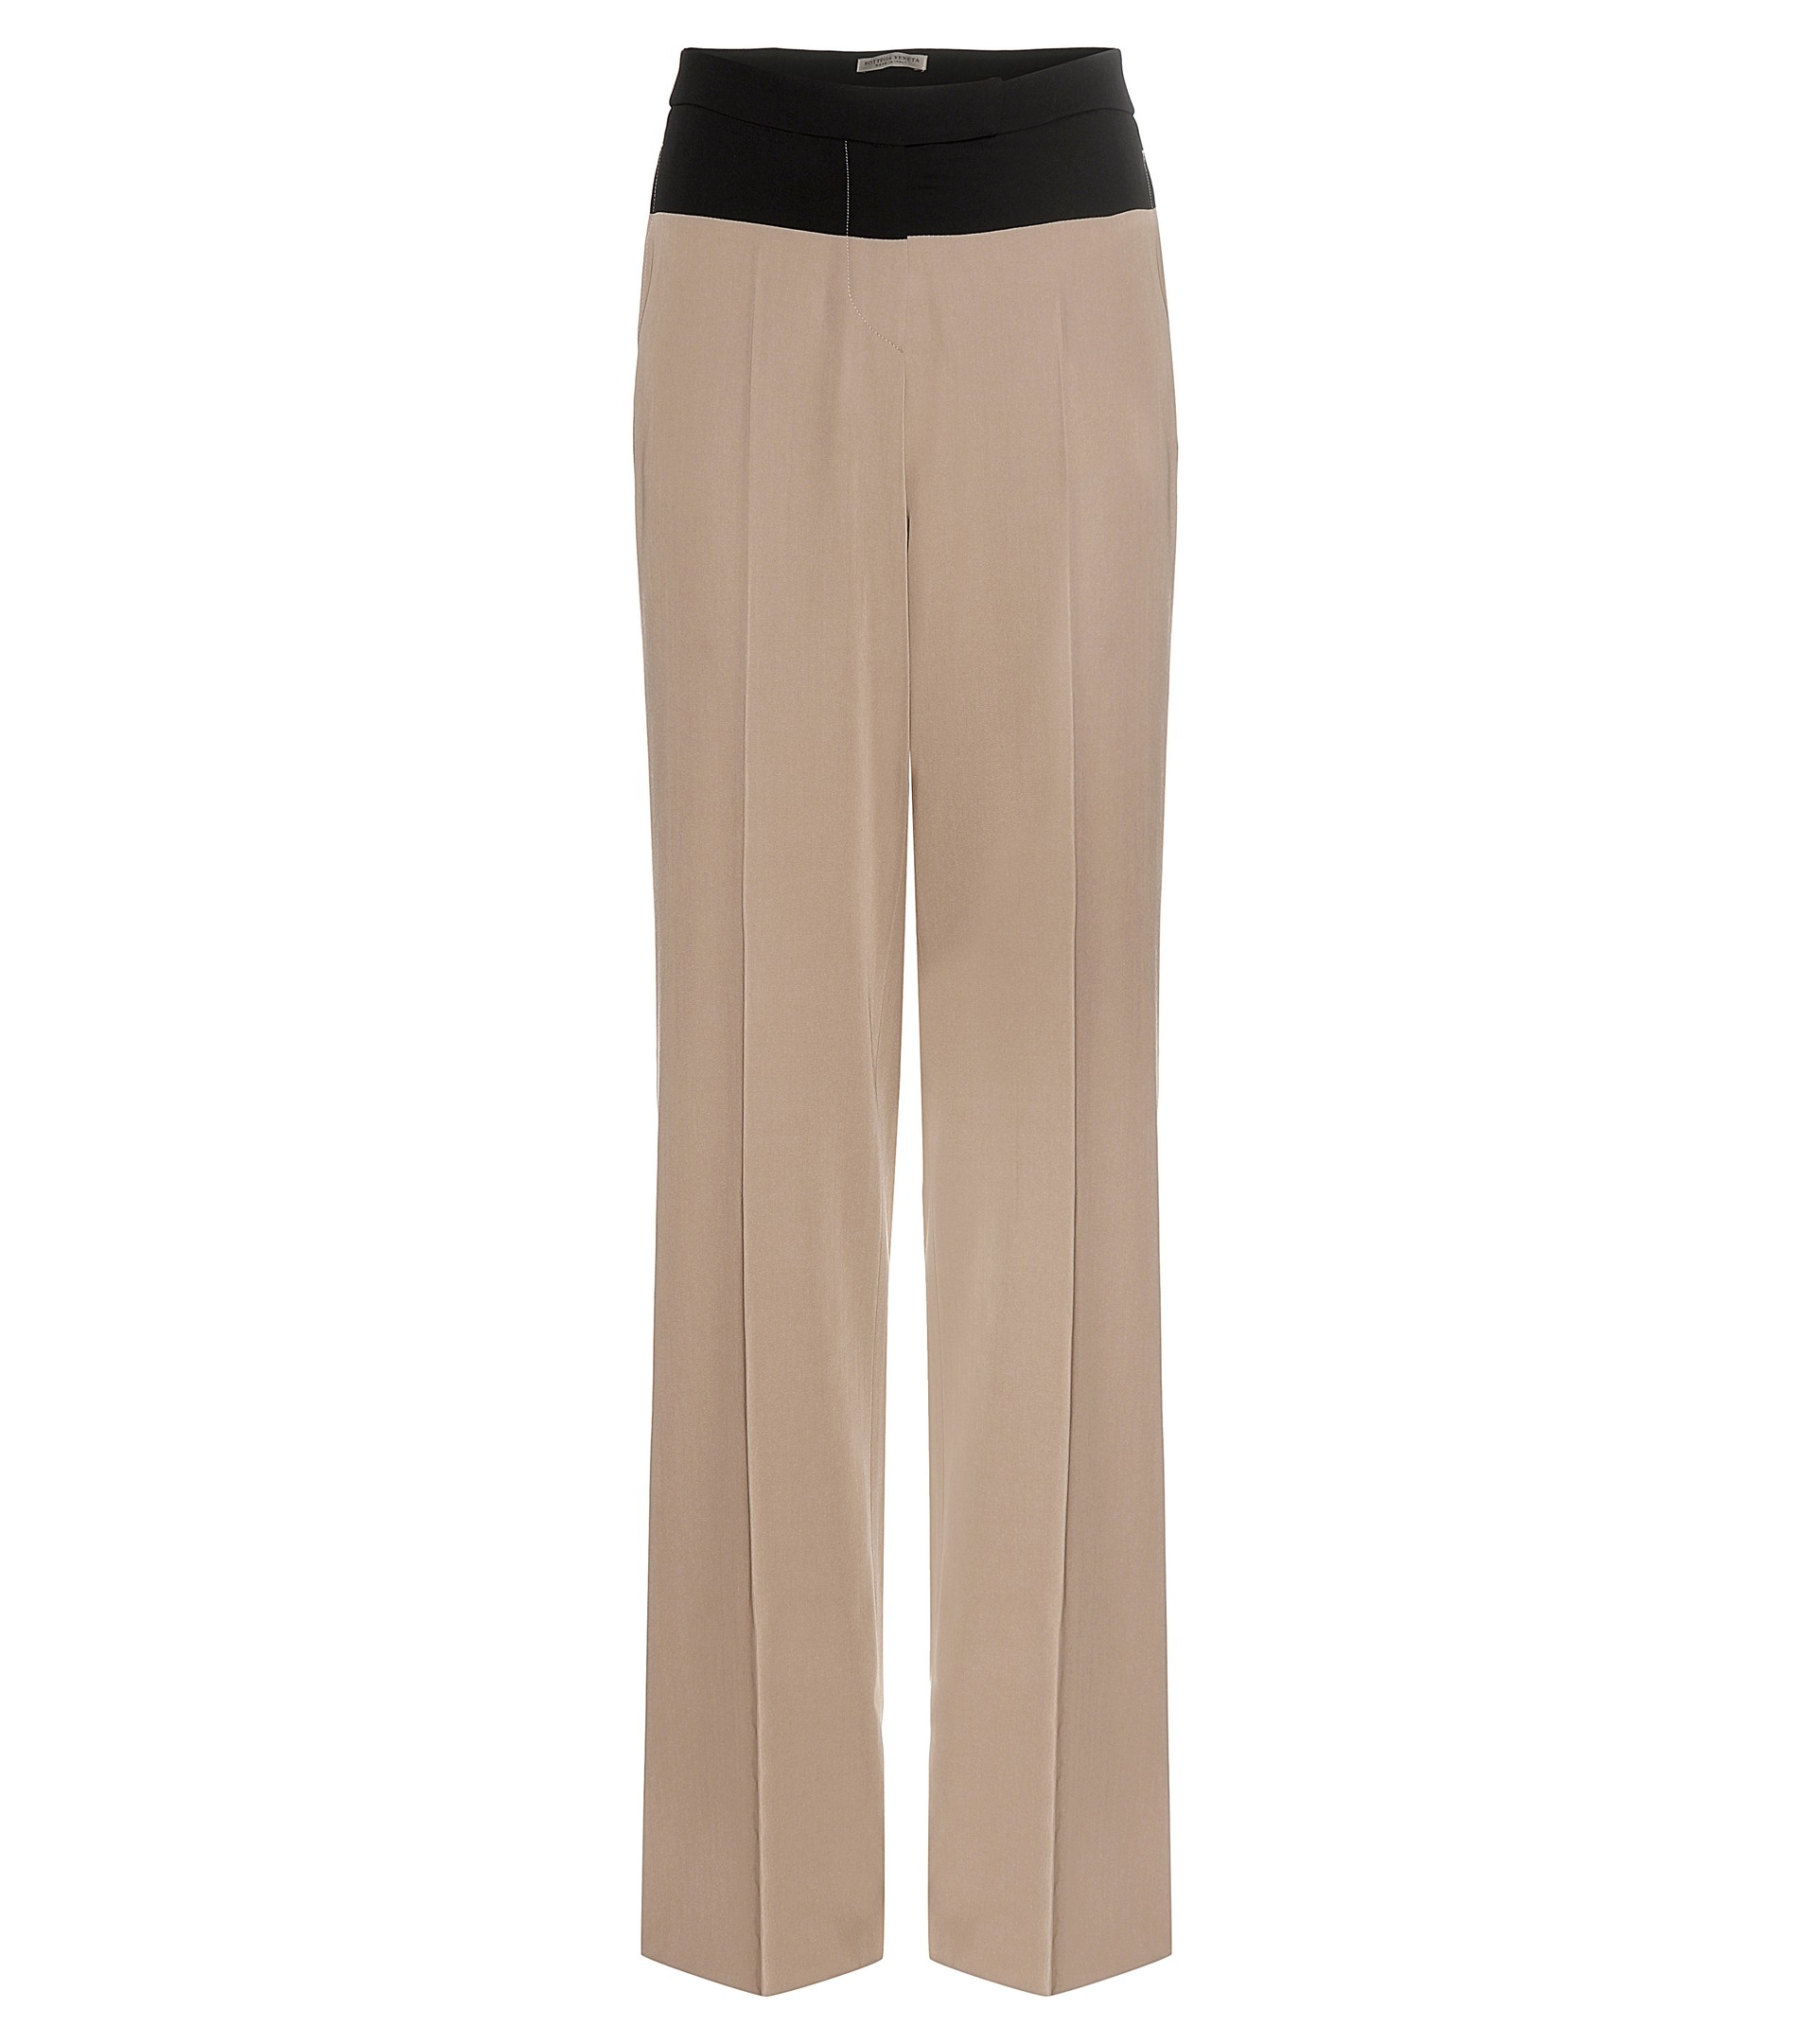 Bottega veneta Wide-leg Wool Trousers in Natural | Lyst